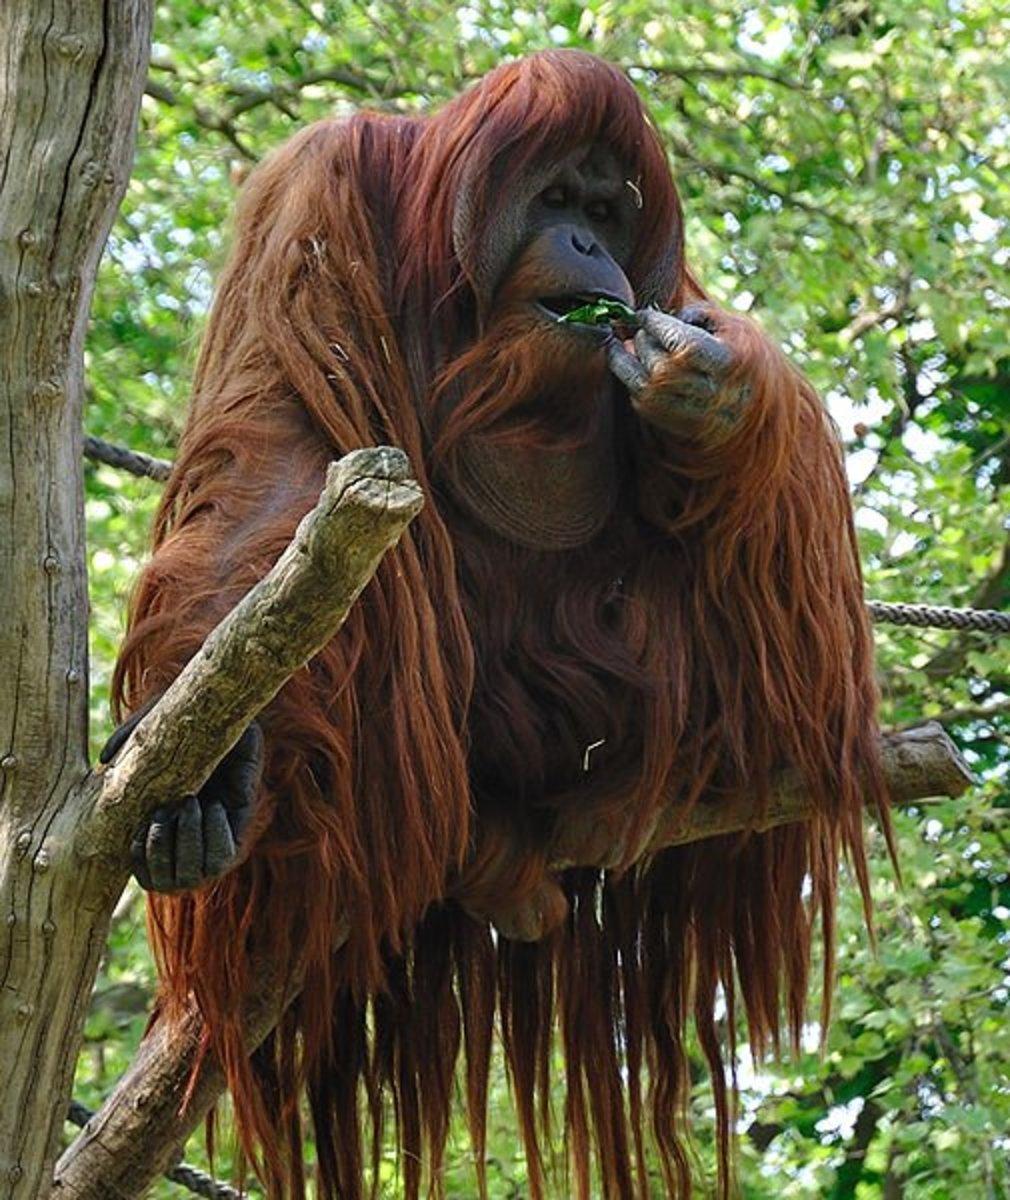 10 Interesting Facts About Orangutans